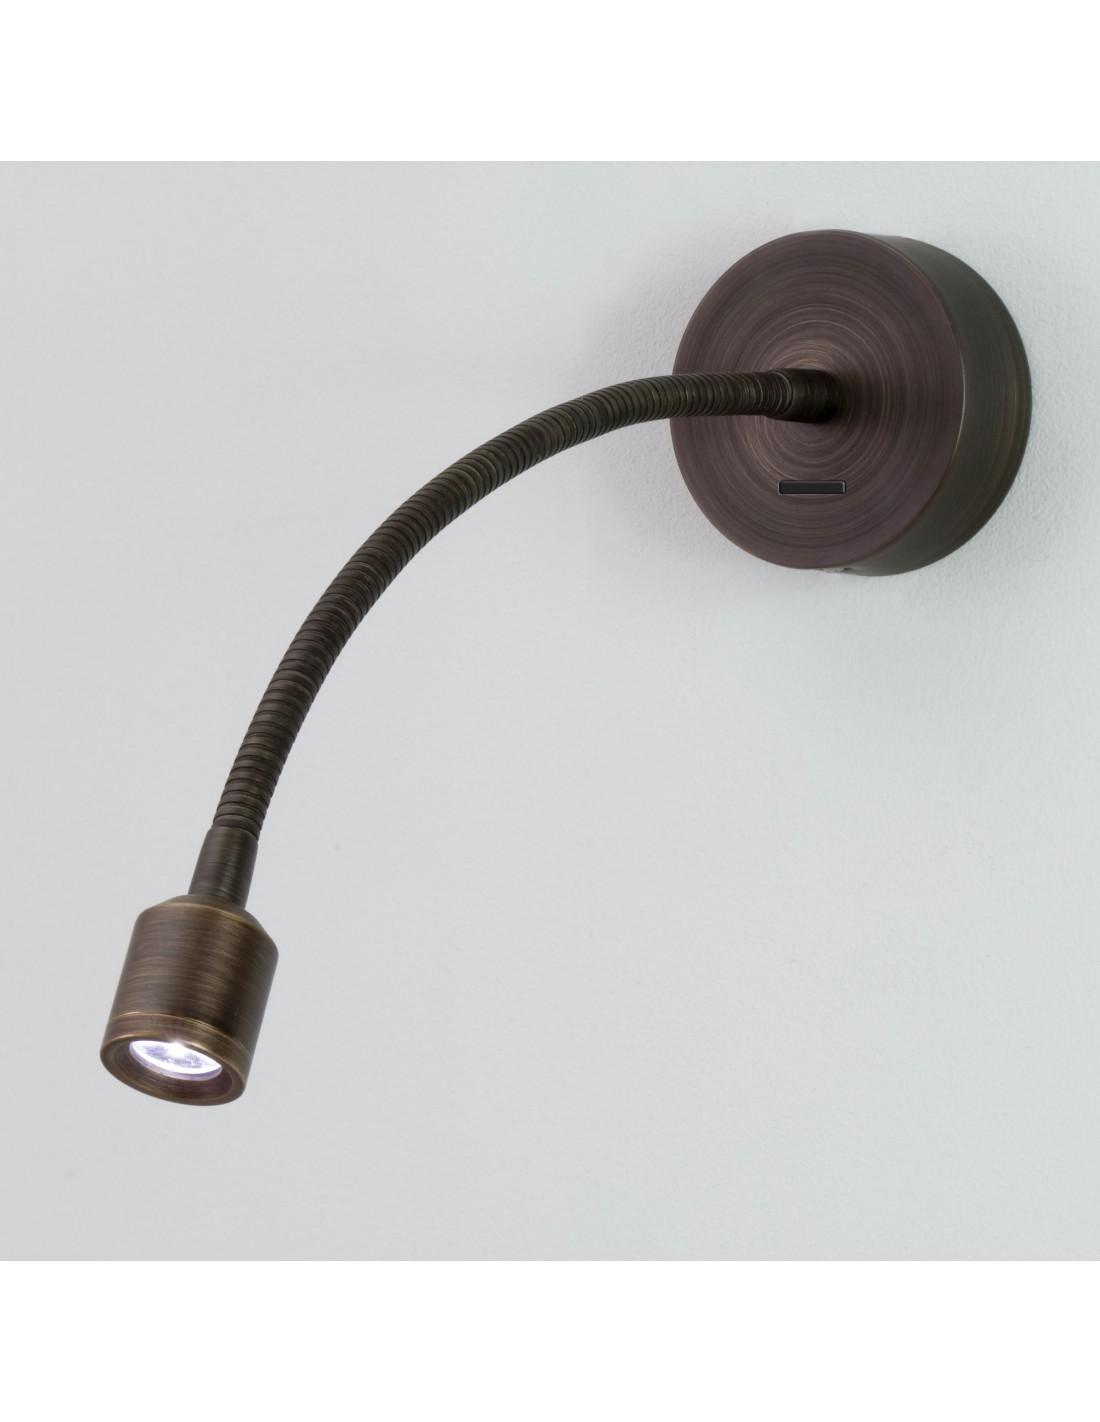 applique fosso switched astro lighting bronze. Black Bedroom Furniture Sets. Home Design Ideas